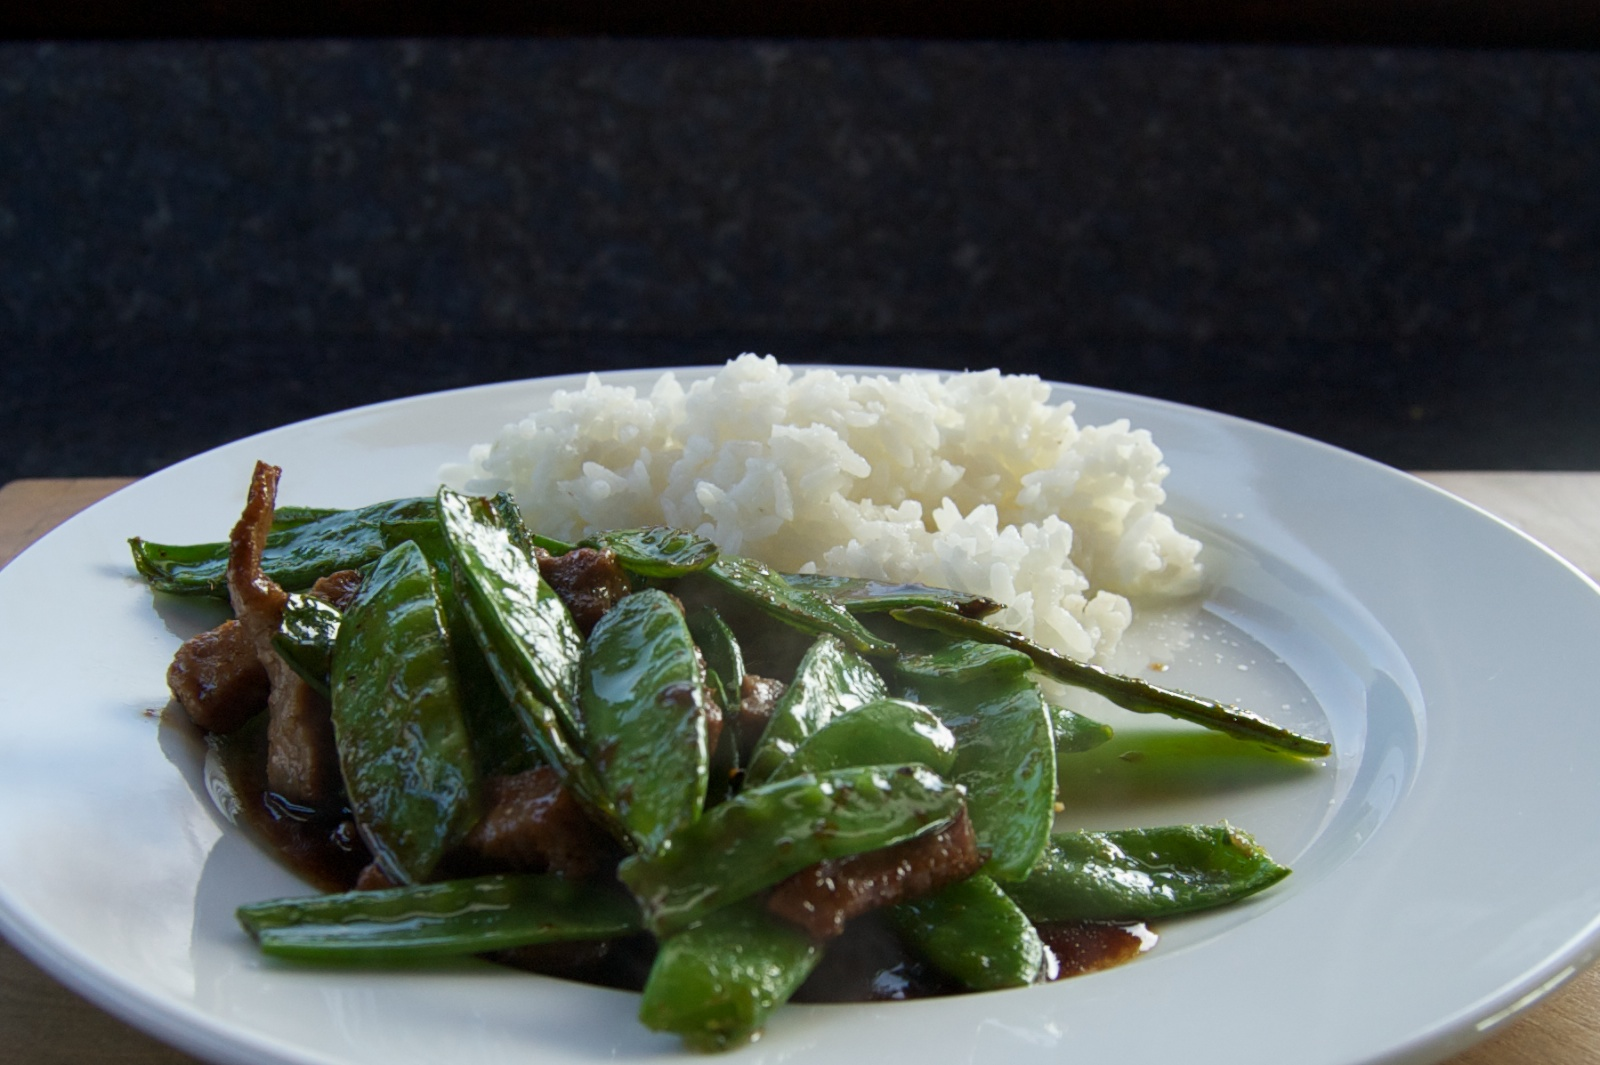 http://blog.rickk.com/food/2013/01/25/ate.2013.01.24.l.jpg